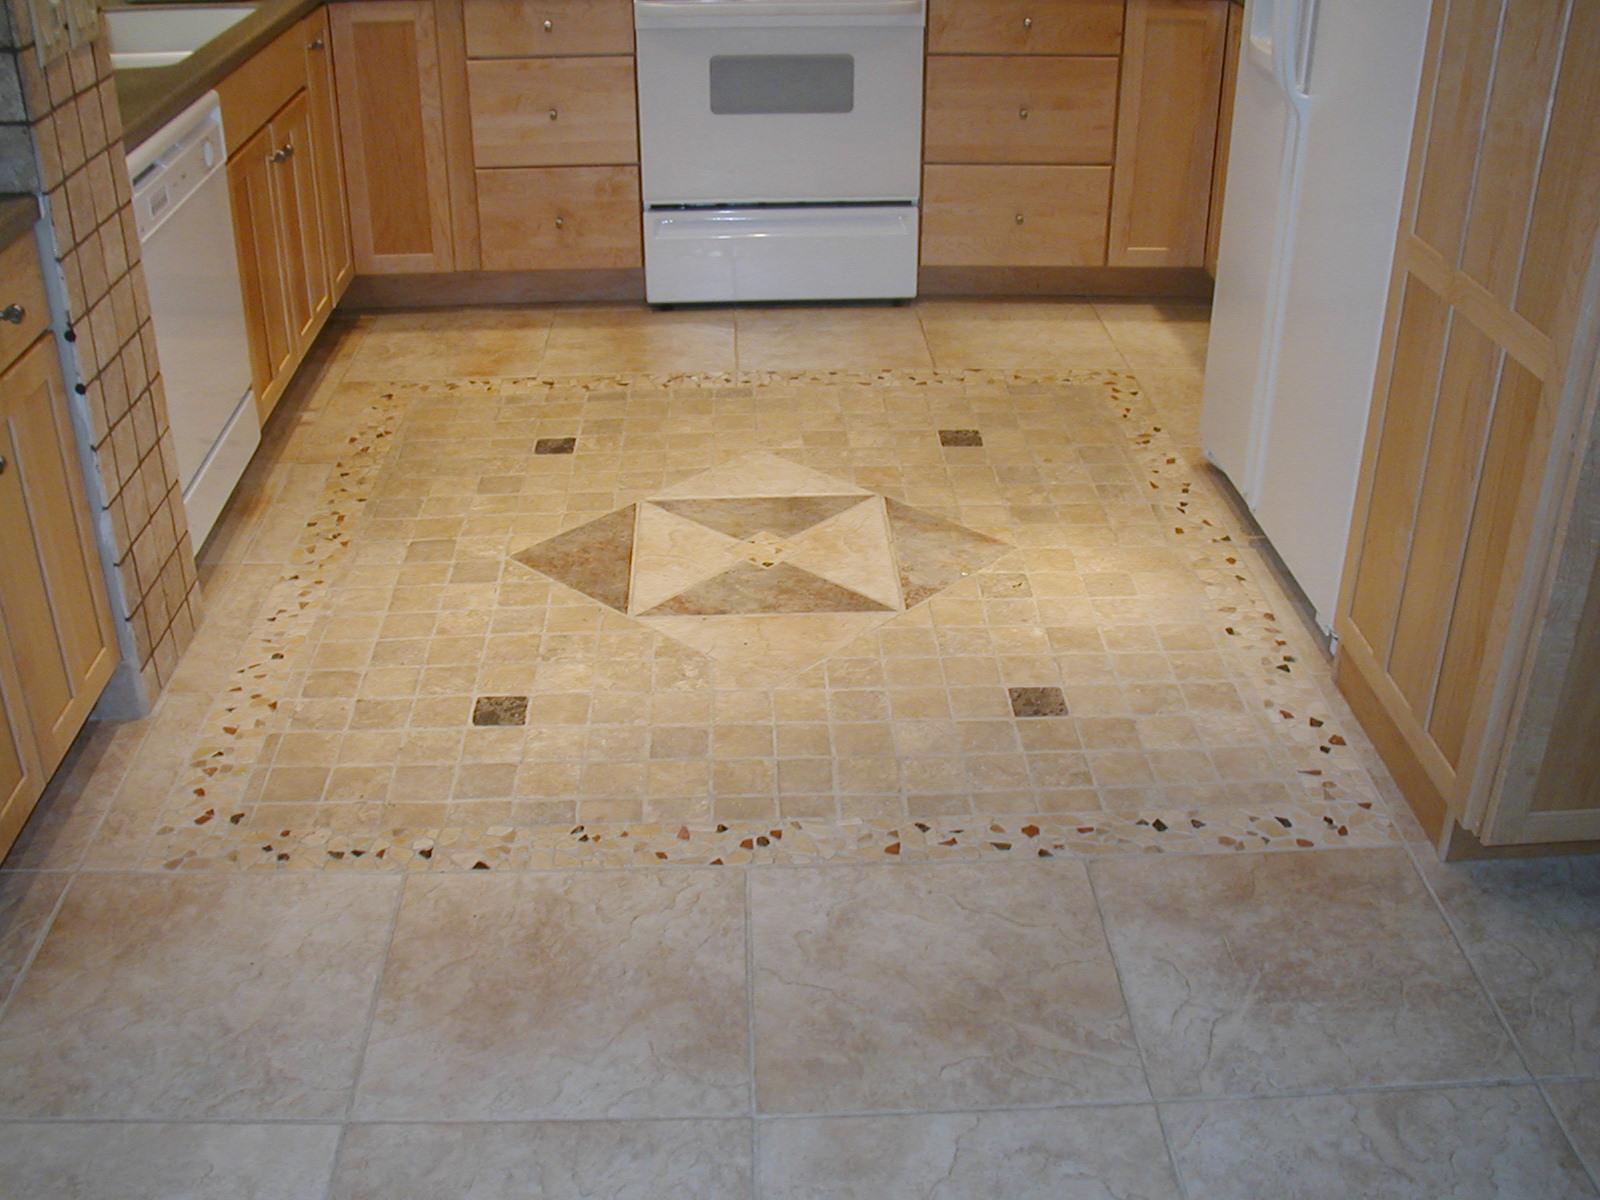 decorations-flooring-nature-travertine-stone-floor-tiles-with-elegant-oak-kitche